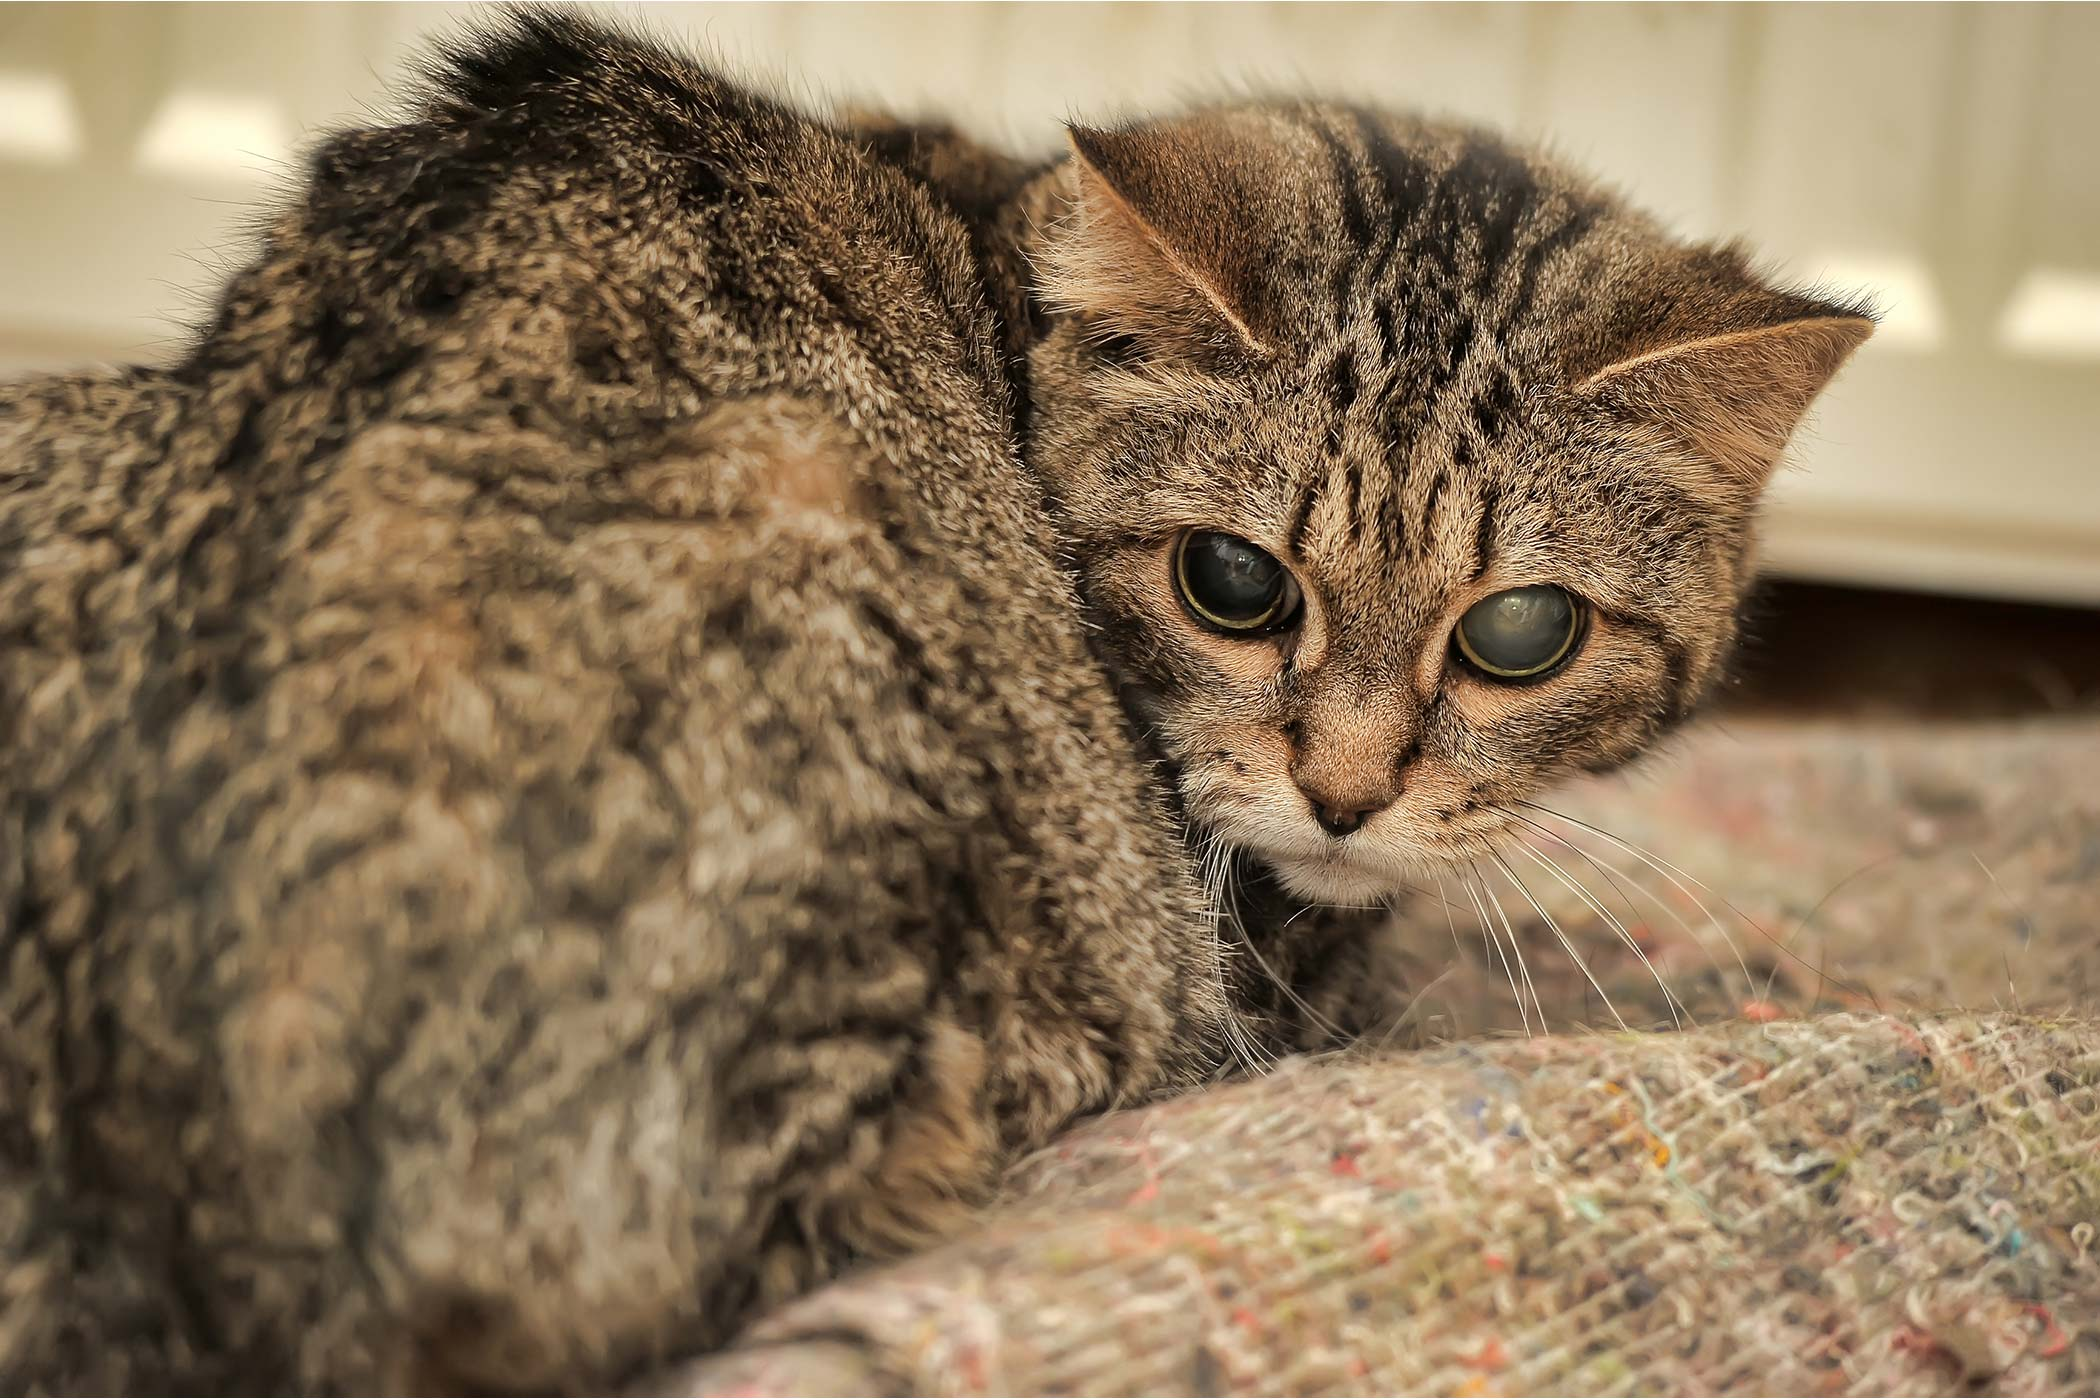 Corneal Disease in Cats